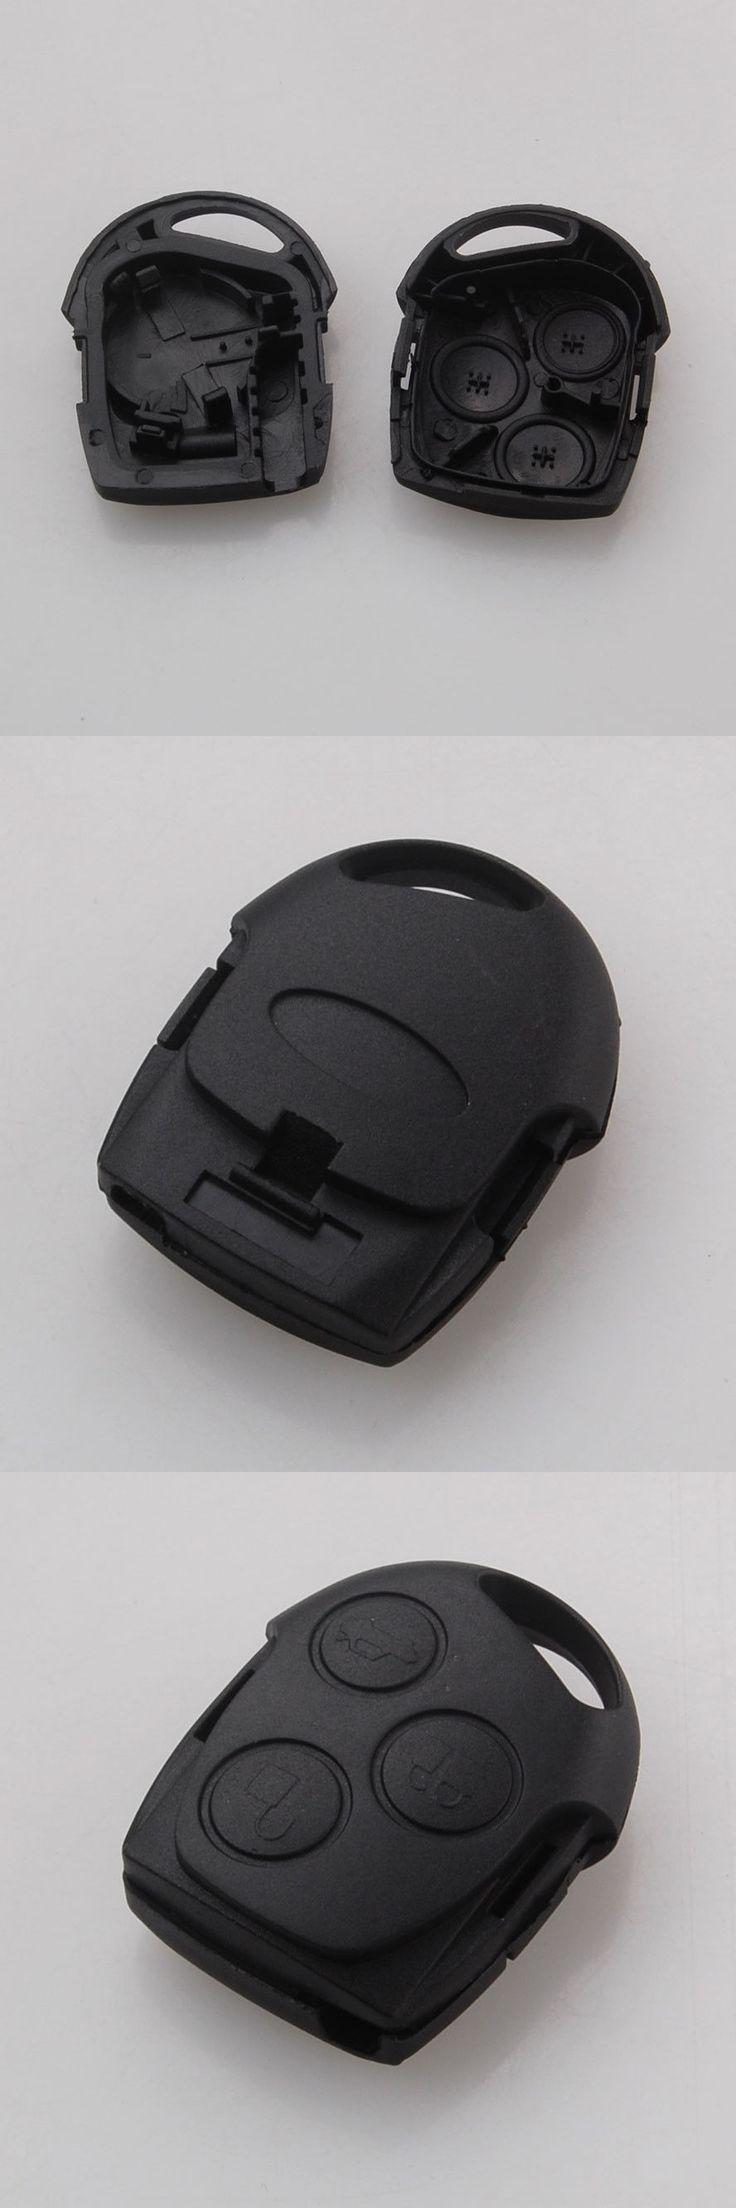 BBQ@FUKA Blank Remote Key Keyless Case Key Shell Part fit for FORD Mondeo Festiva C-Max